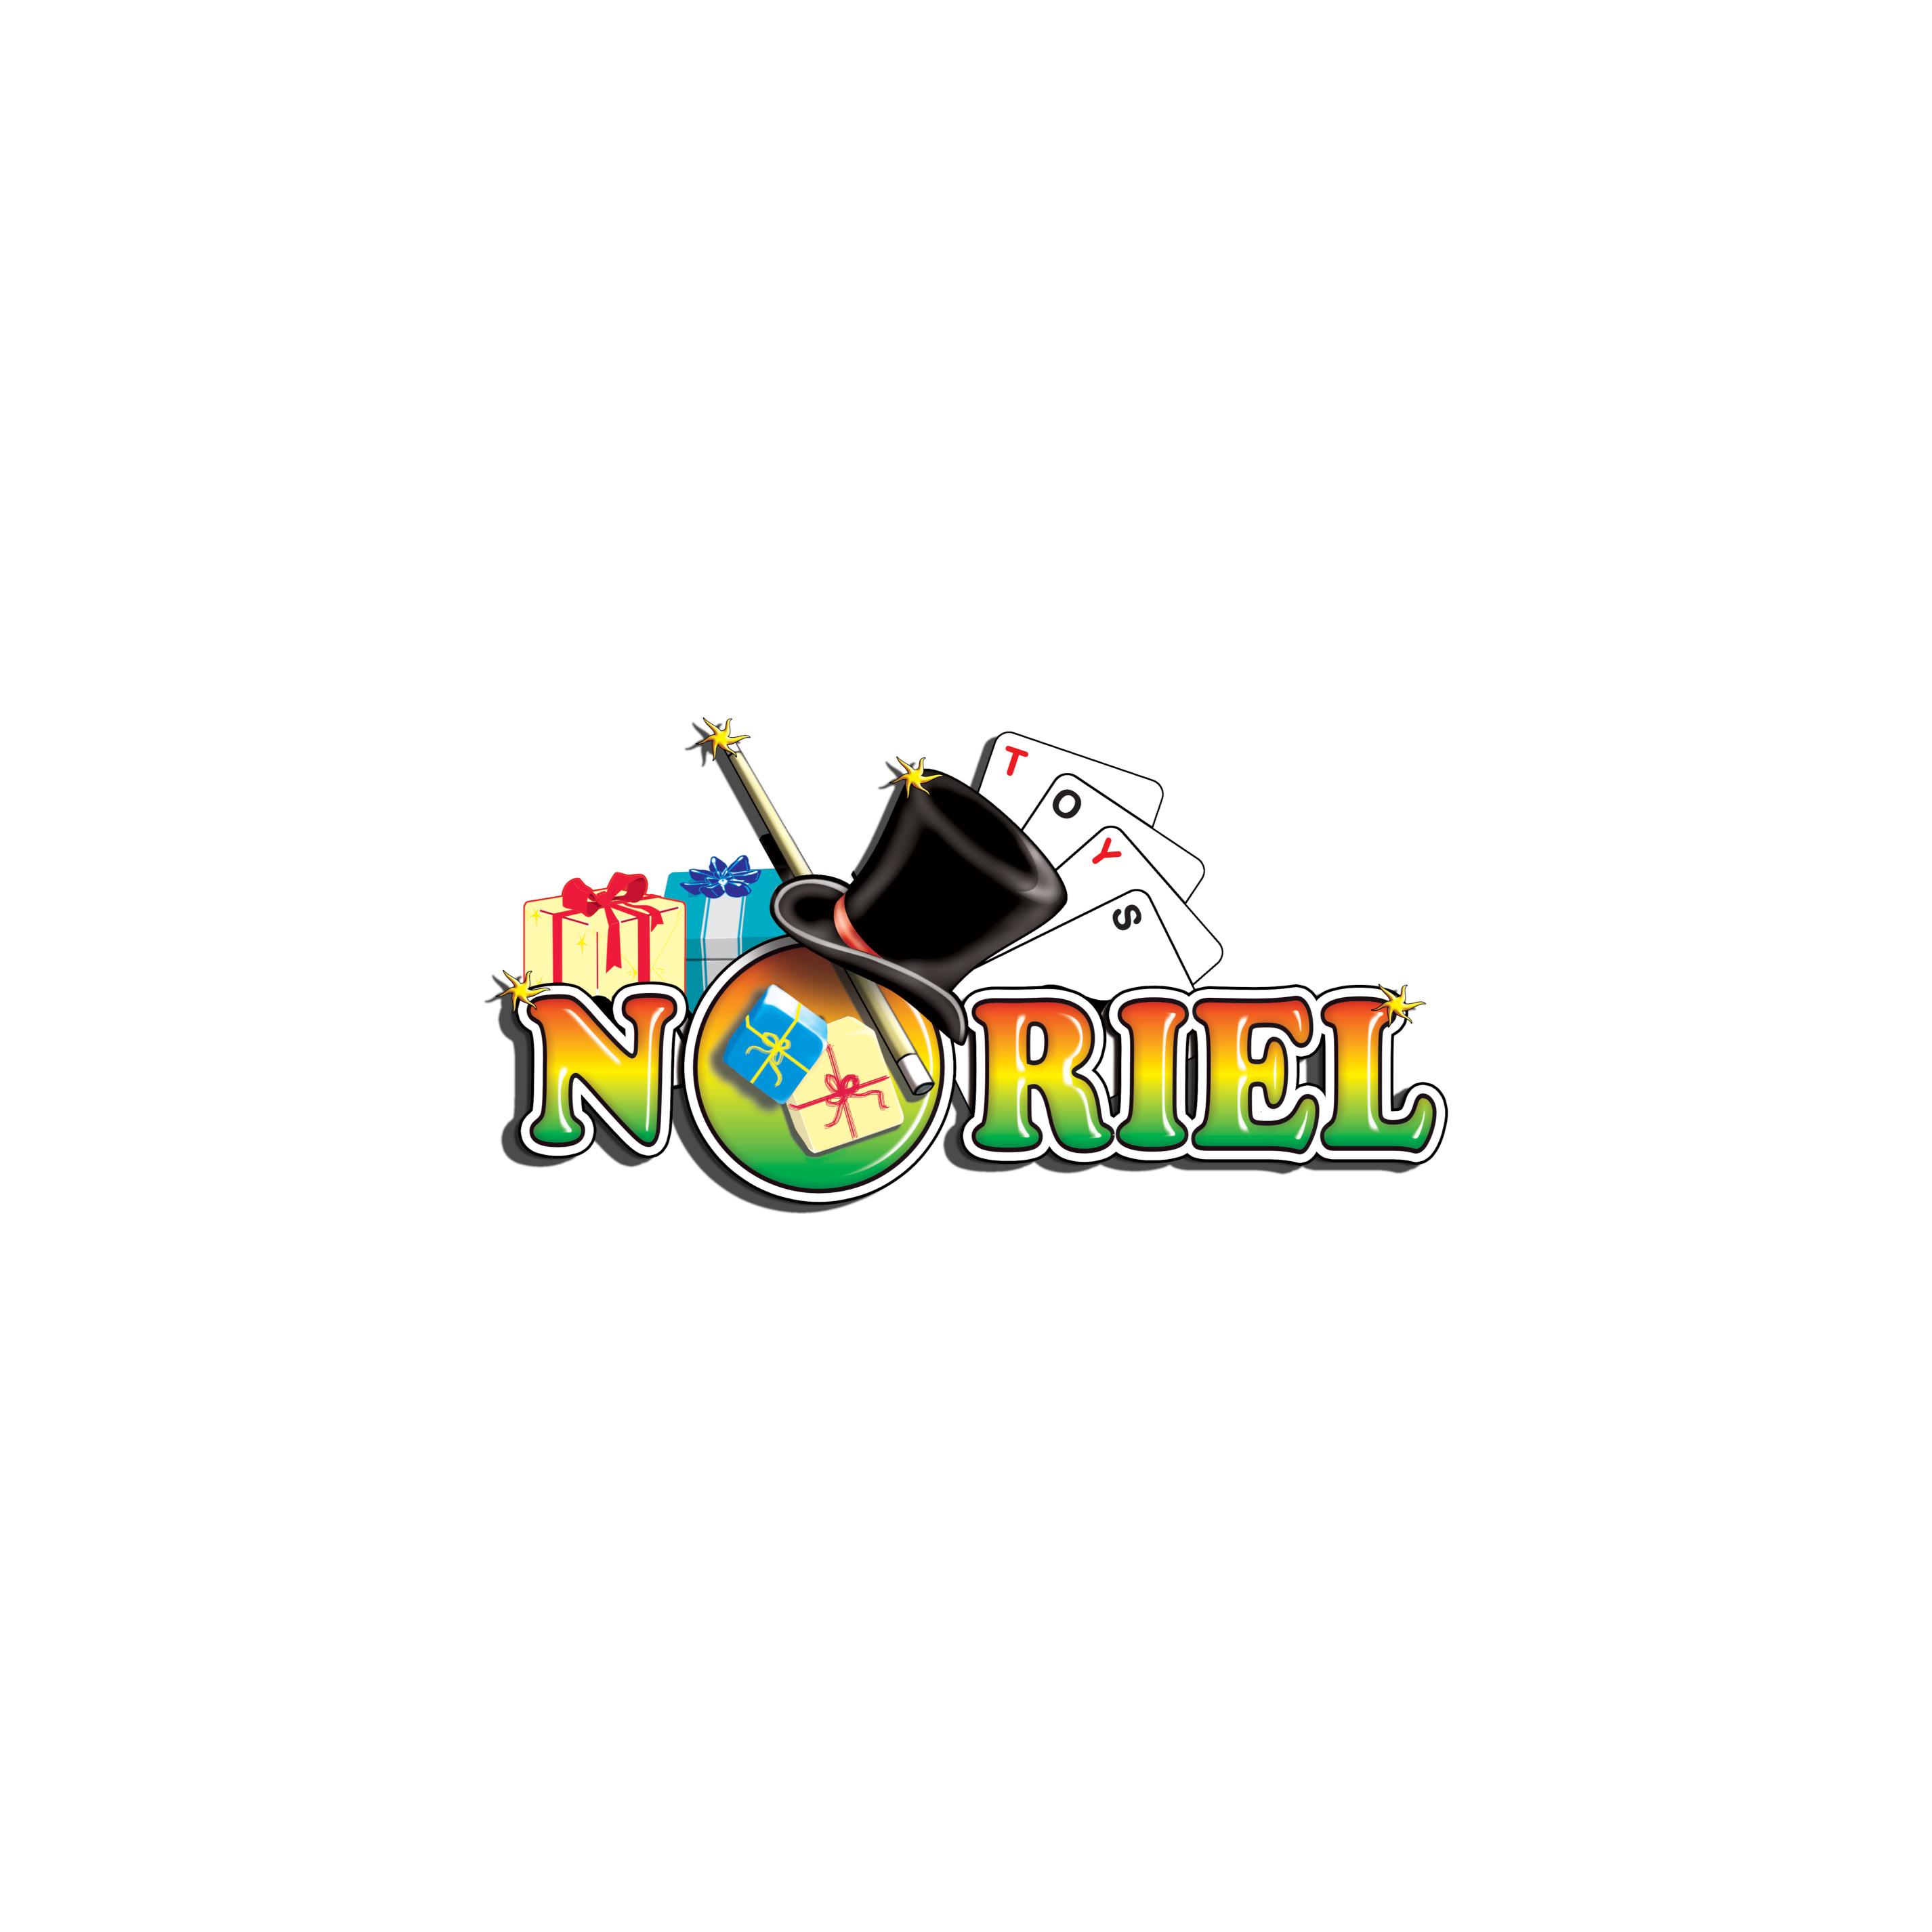 DK000562423_001w Ghiozdan de plus Disney Mickey Mouse, 26 x 32 cm